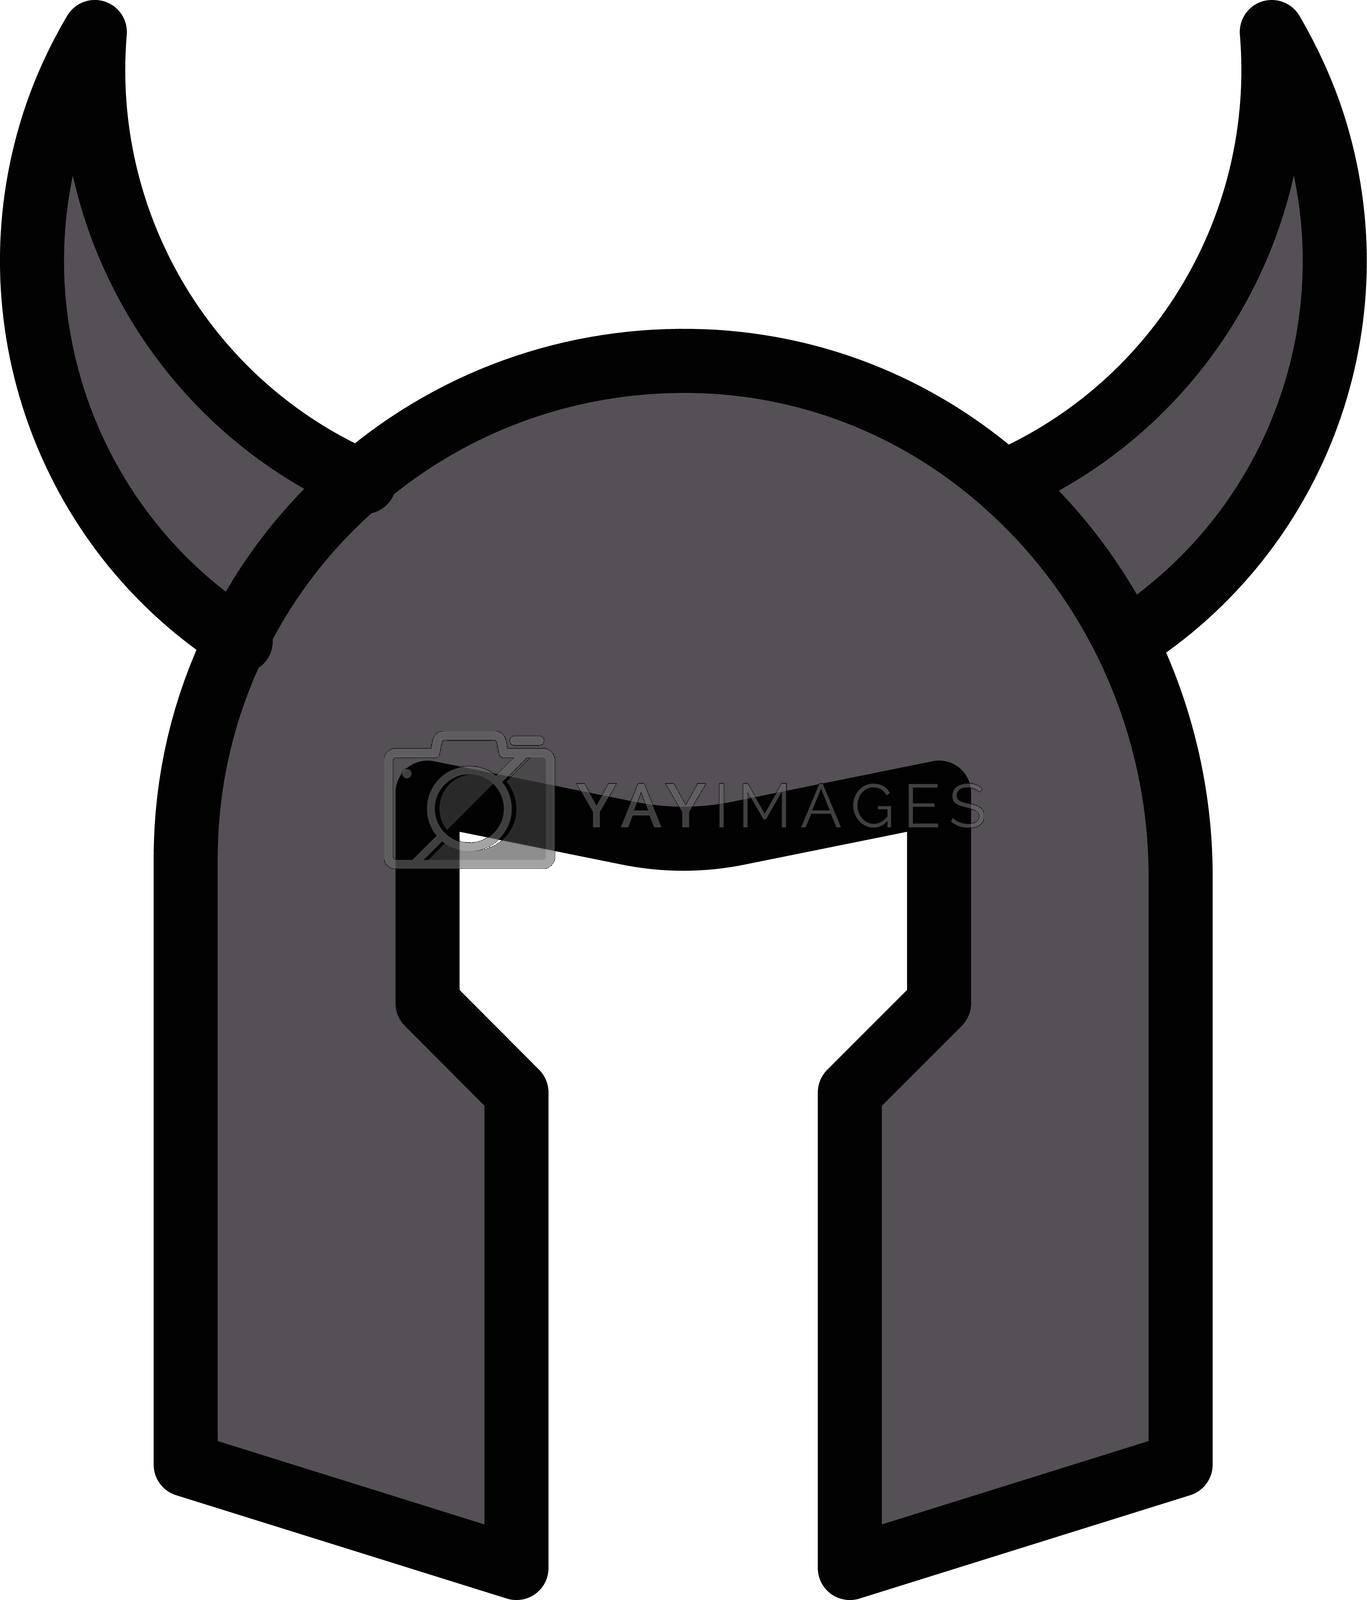 Royalty free image of helmet warrior by vectorstall